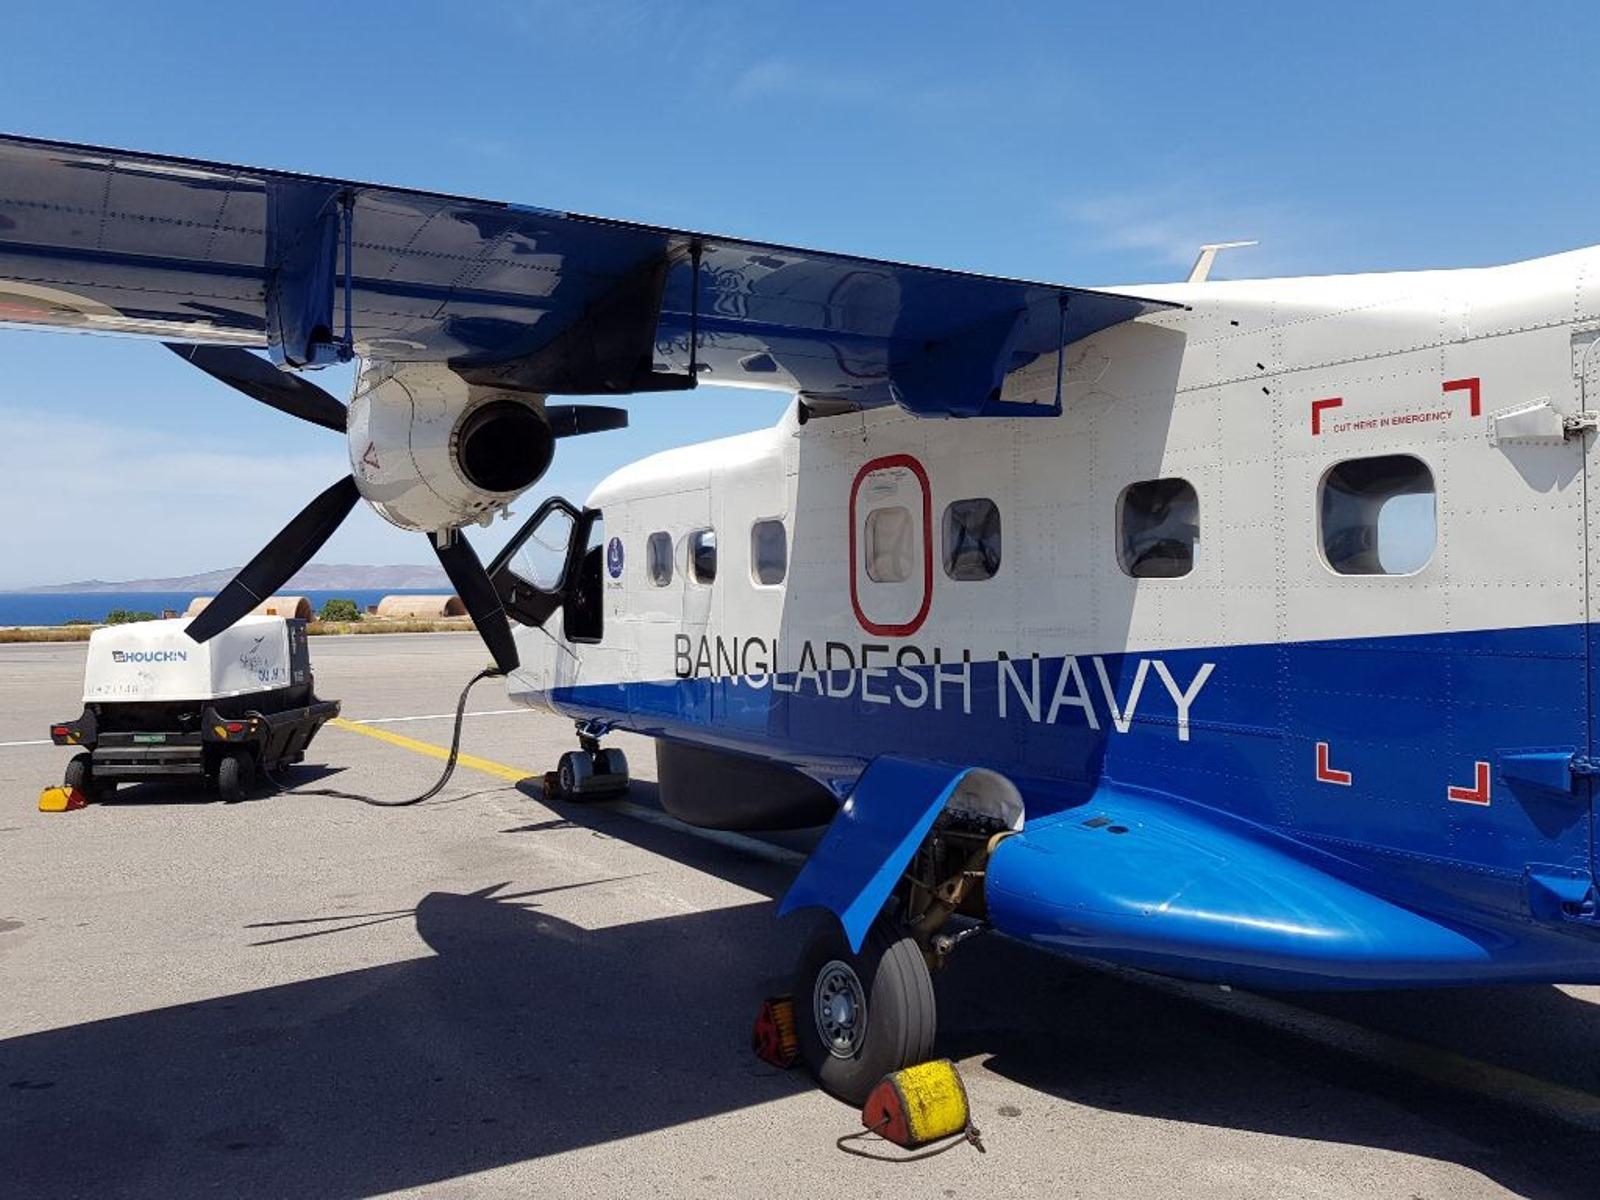 RUAG International Completes 72-Month Inspection on Bangladesh Navy Dornier 228